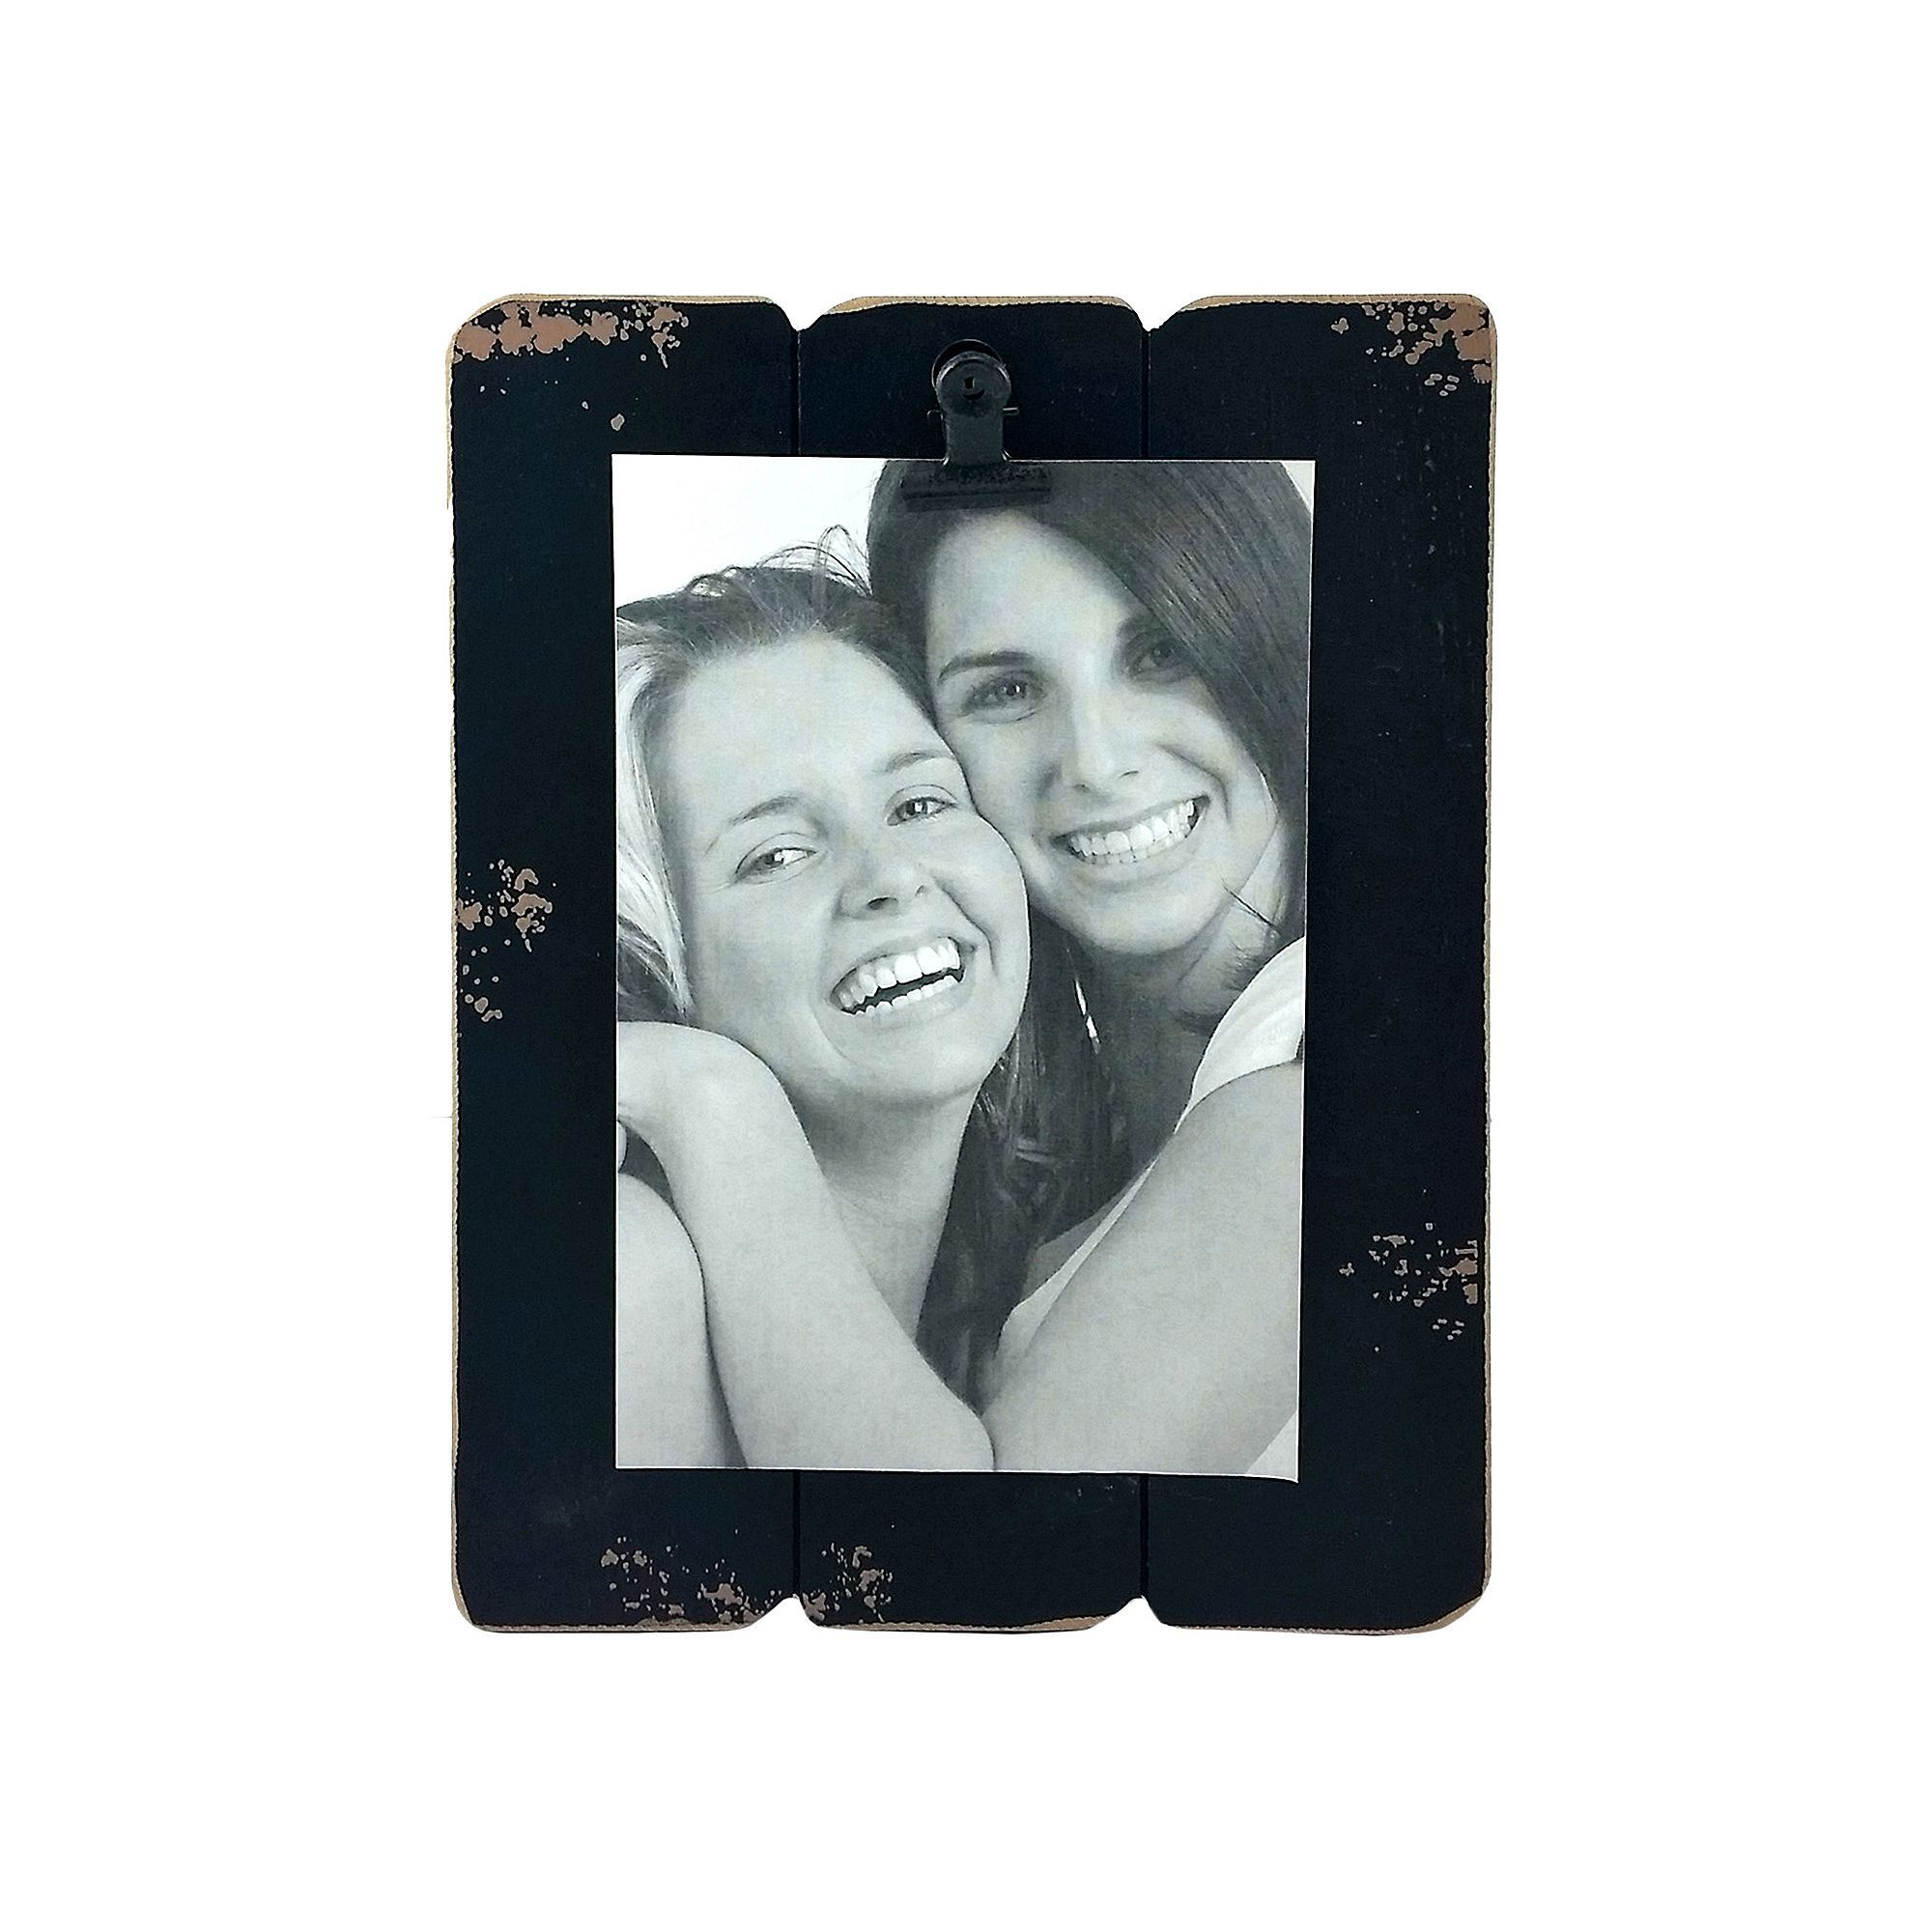 Fetco Home Decor Slats 4\'\' x 6\'\' Photo Clip Frame, Black | Products